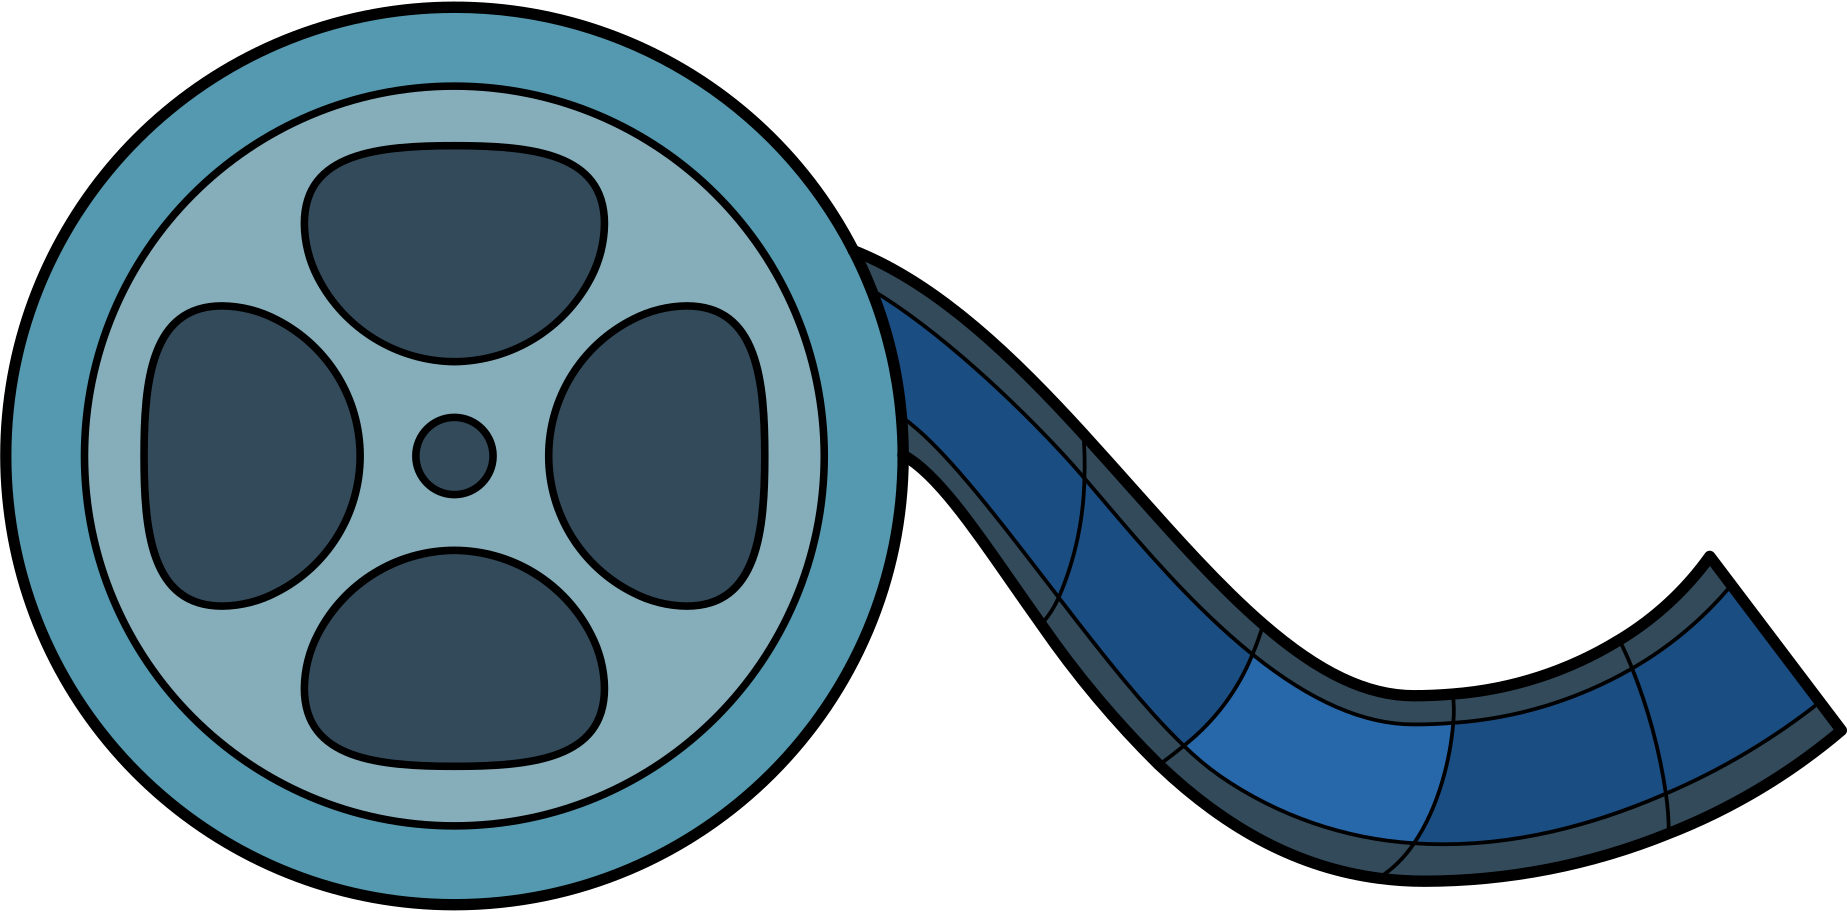 movie film Clipart illustration in PNG, SVG